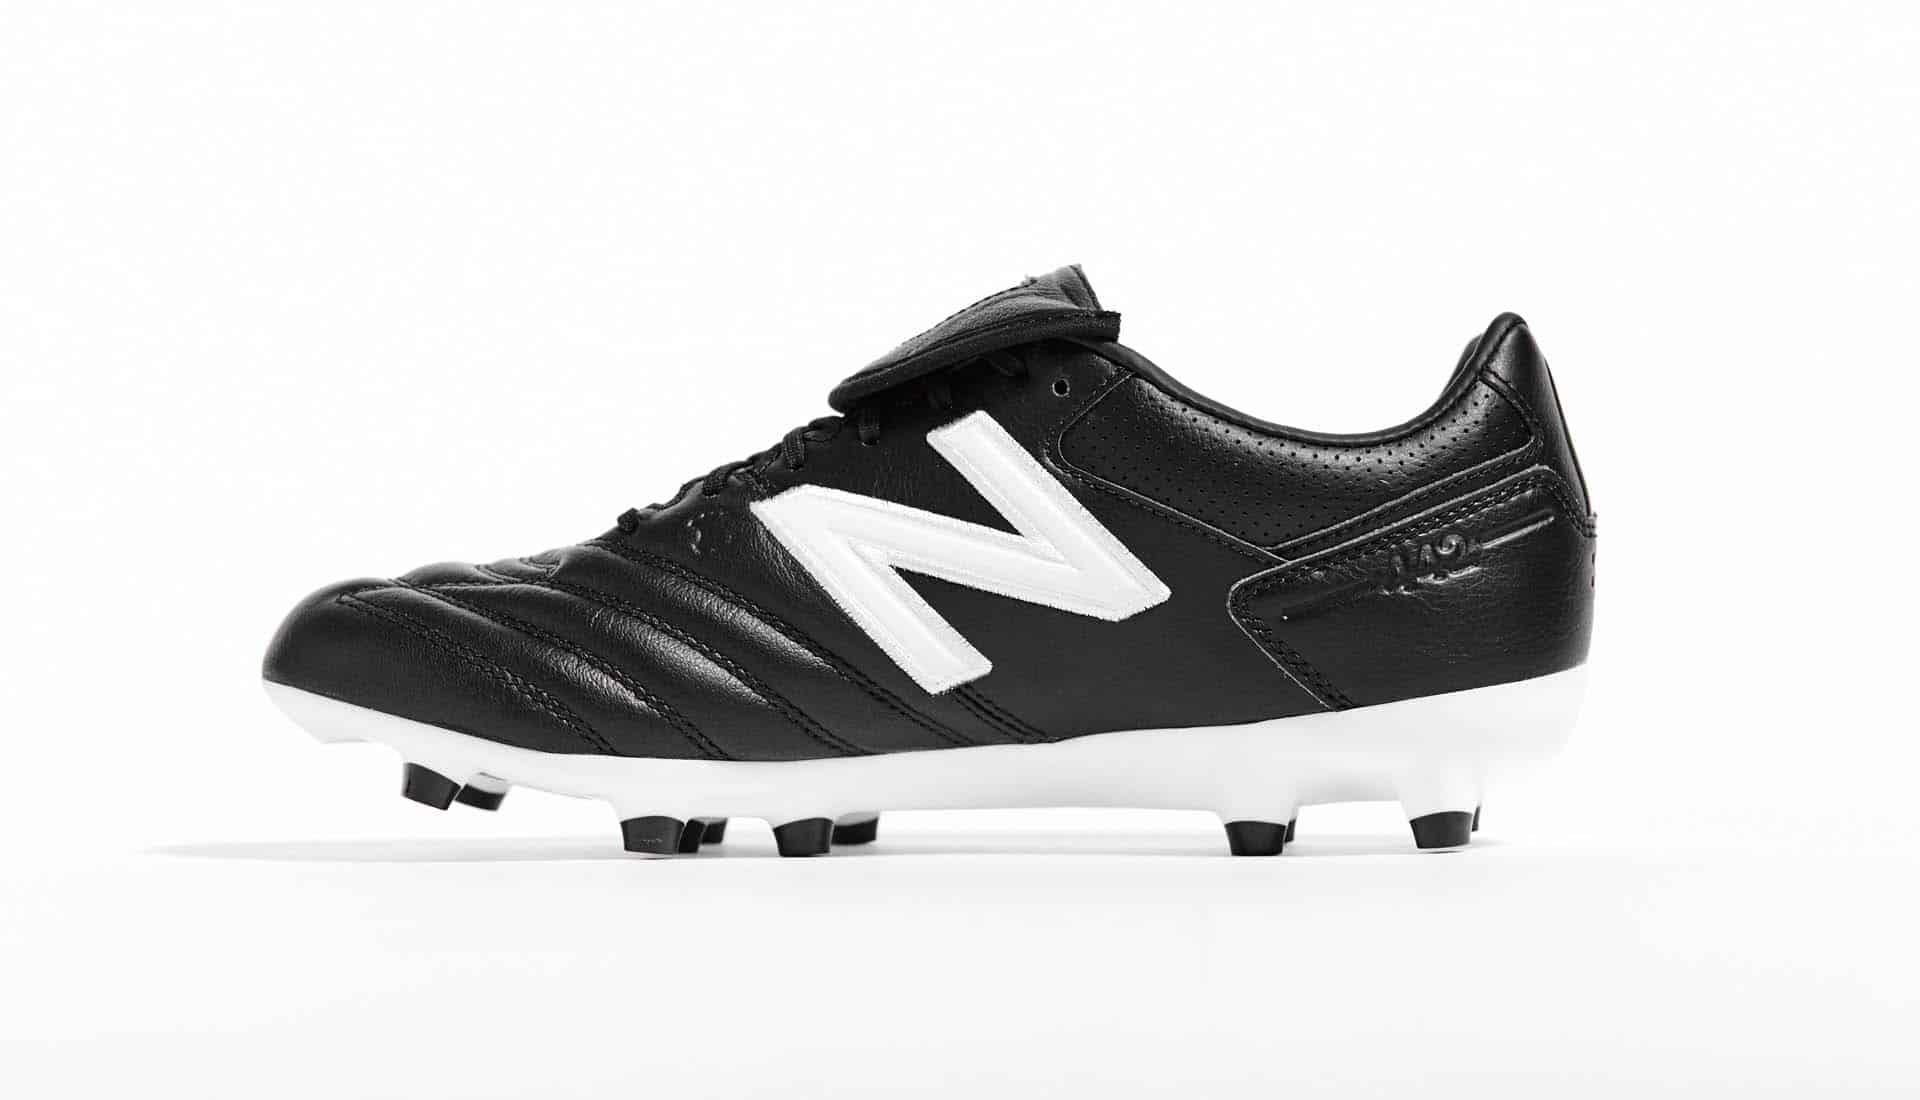 chaussures-football-New-Balance-4-4-2-noir-blanc-img3